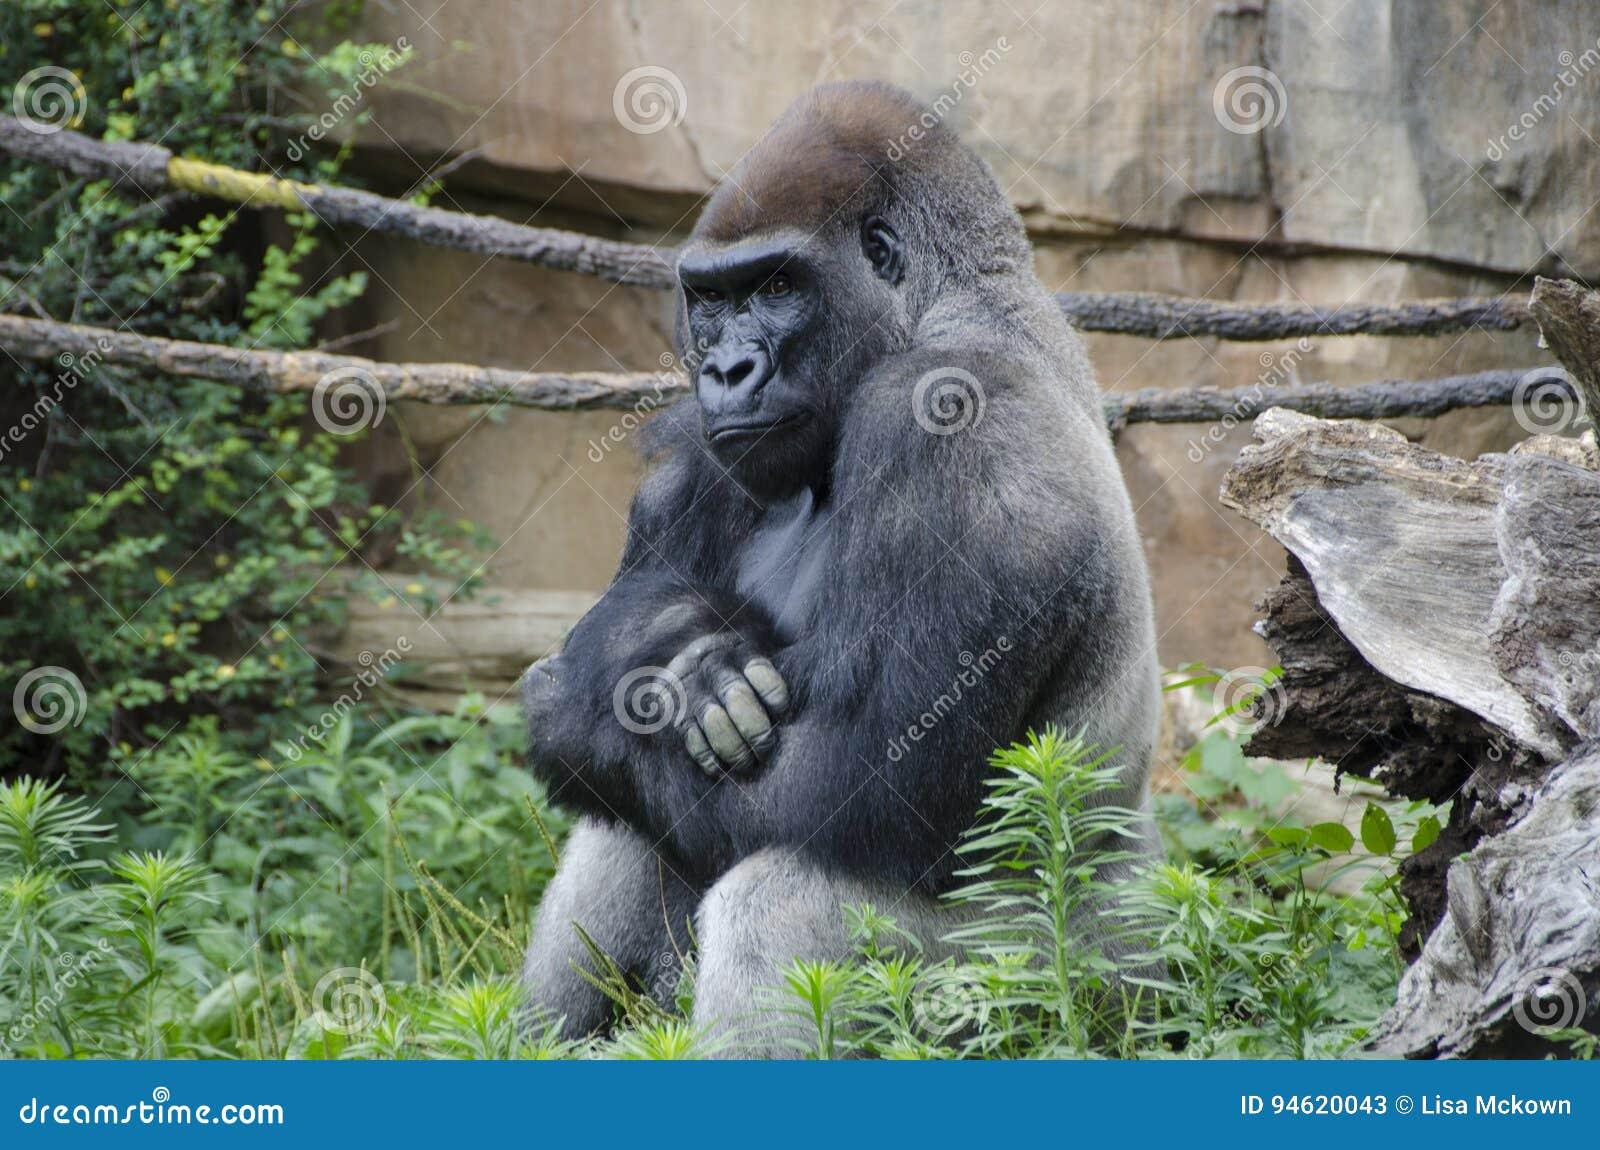 Western Lowland Gorilla in Zoo